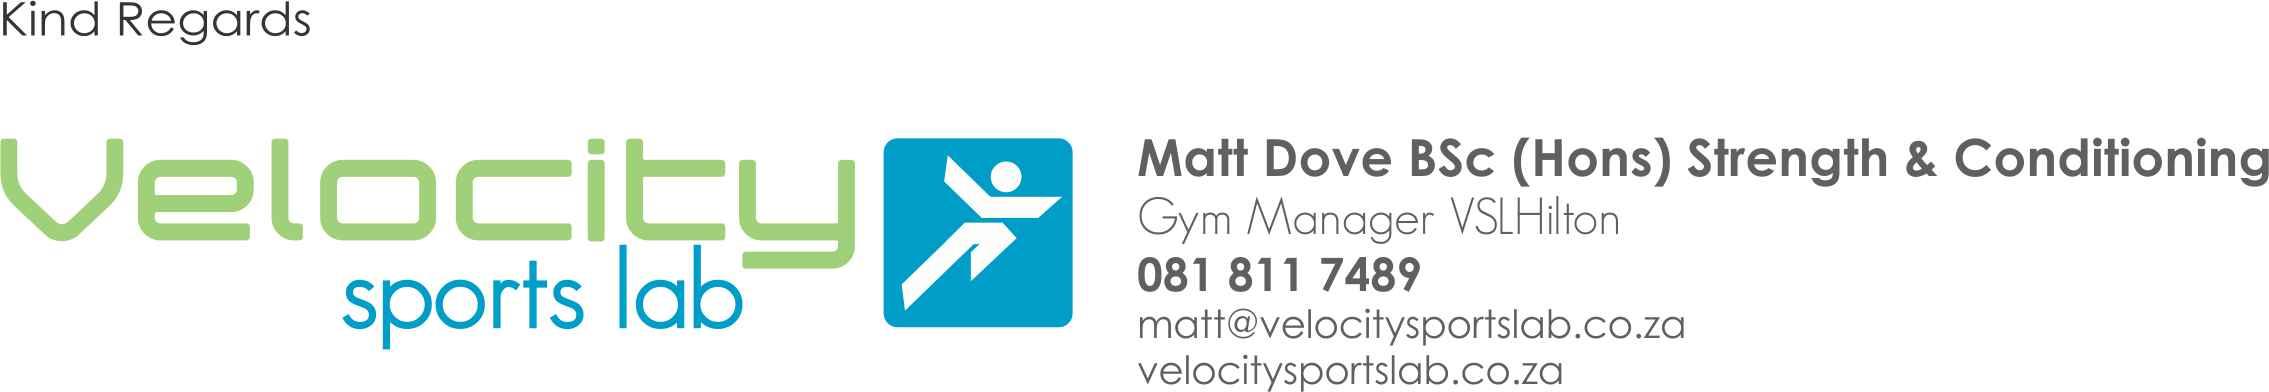 VSL Hout Bay Velocity_Sports_lab_Matthew_Dove_email_sig